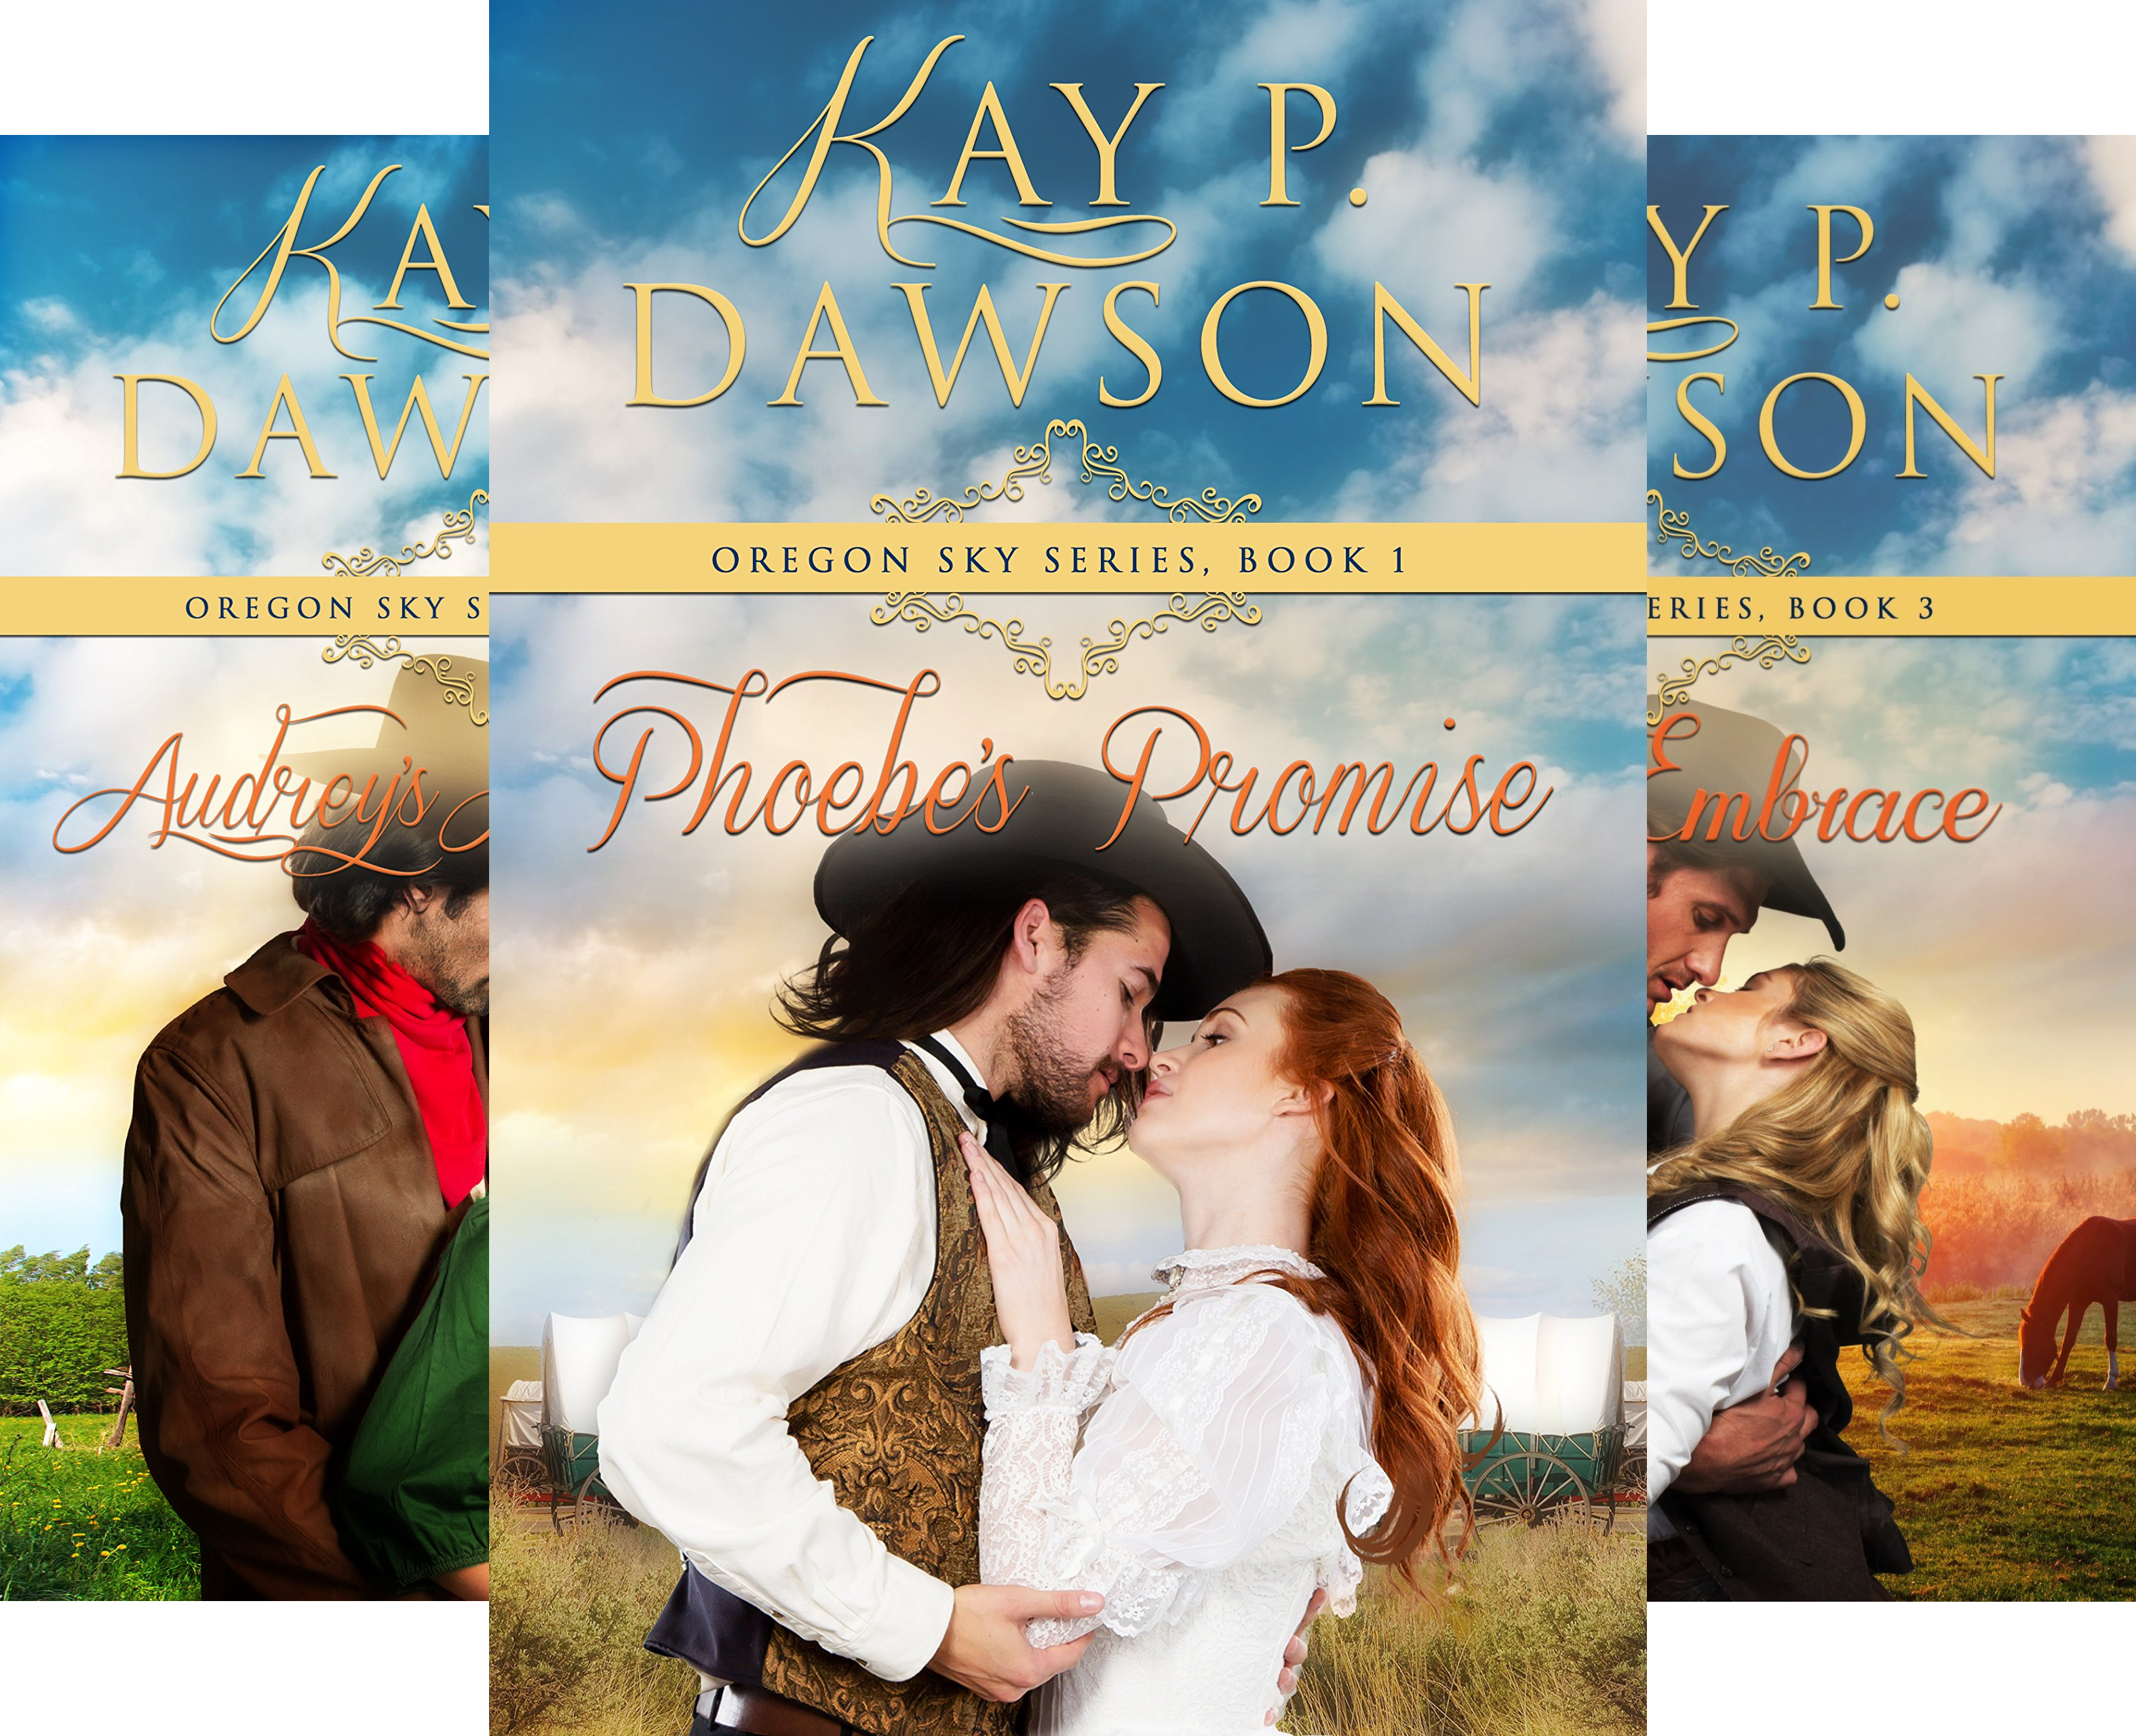 Oregon Sky Series (4 Book Series)